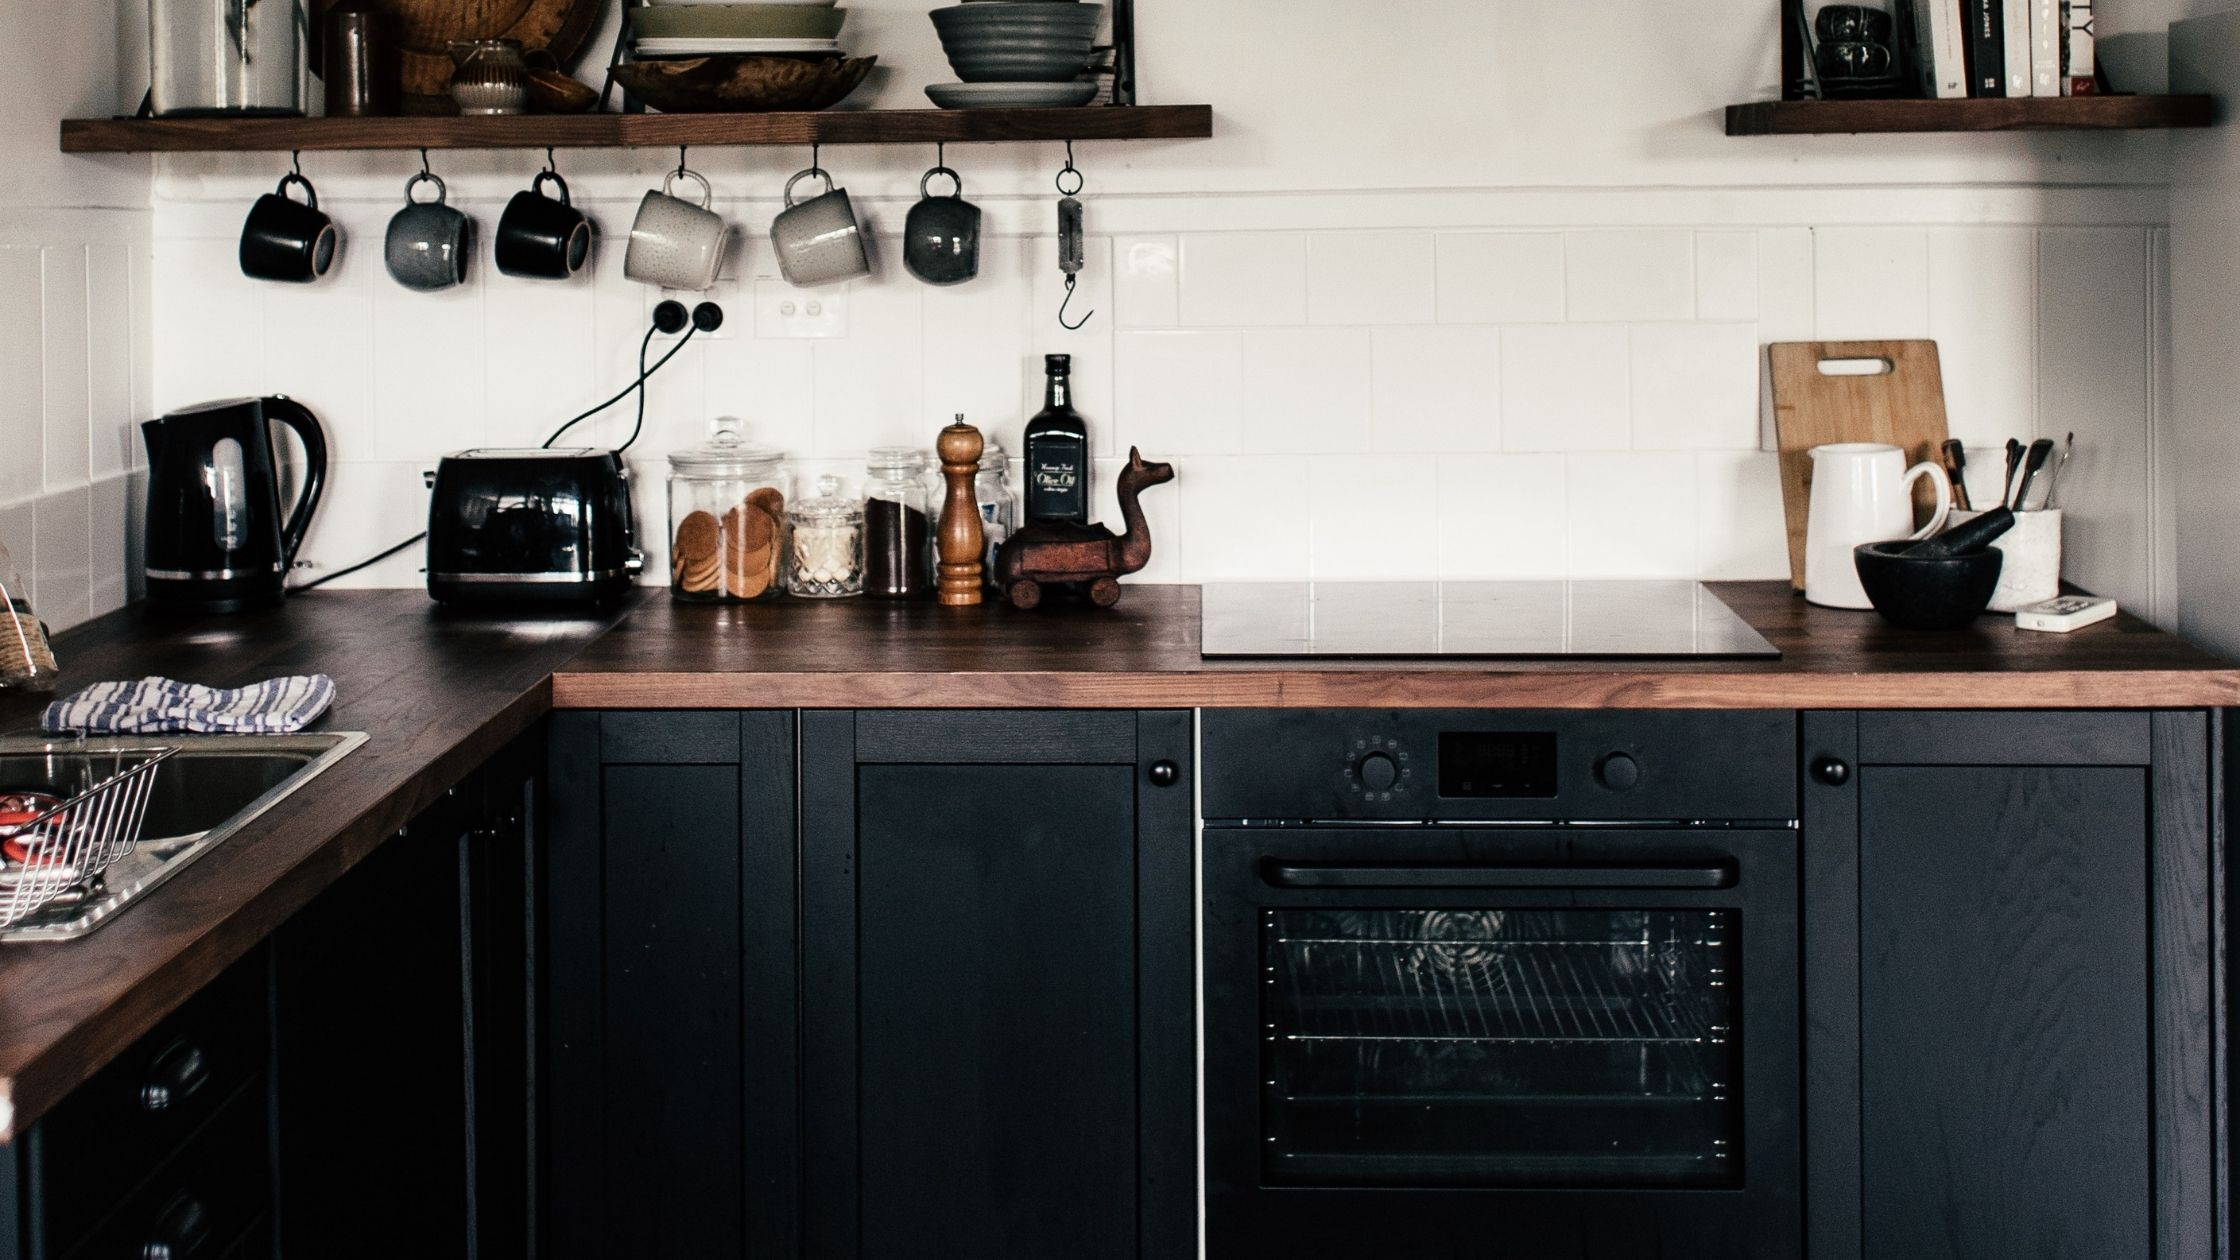 Holz-Lack in schwarz